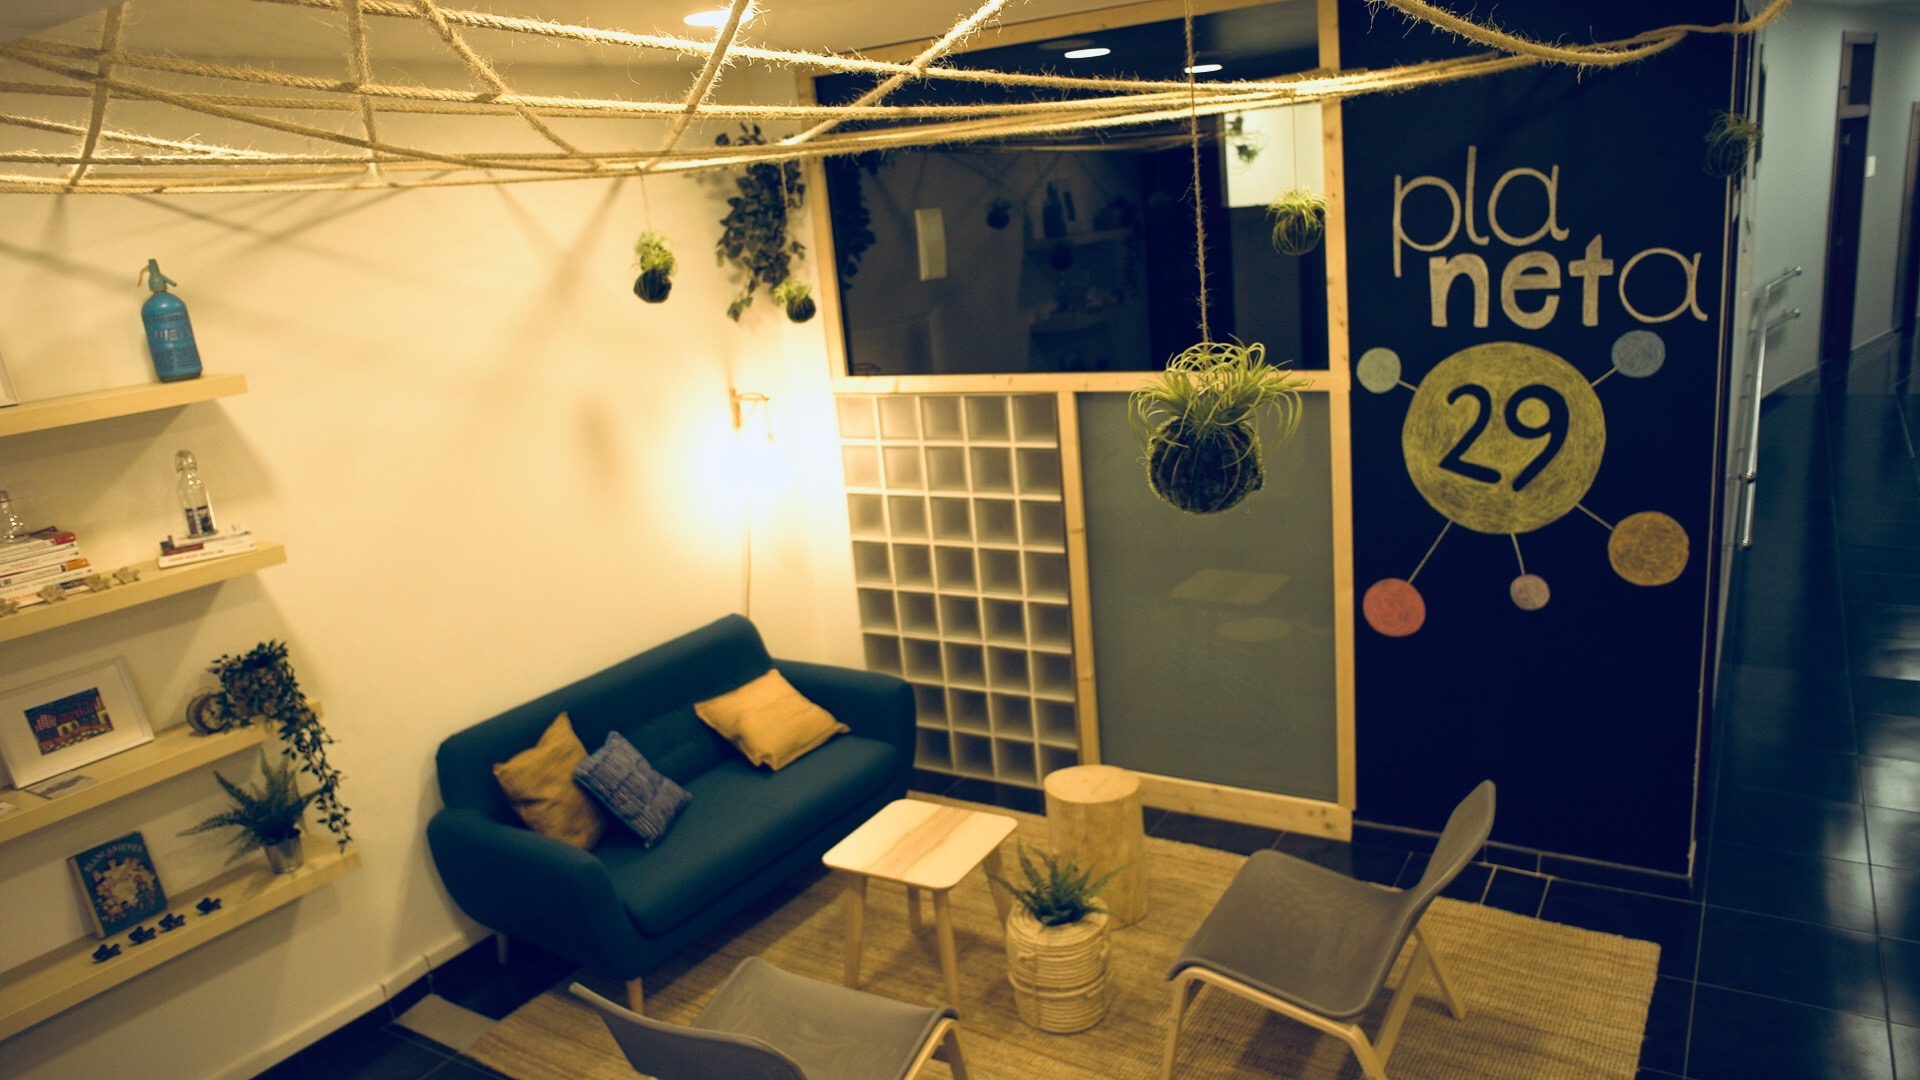 Planeta29, Pontevedra